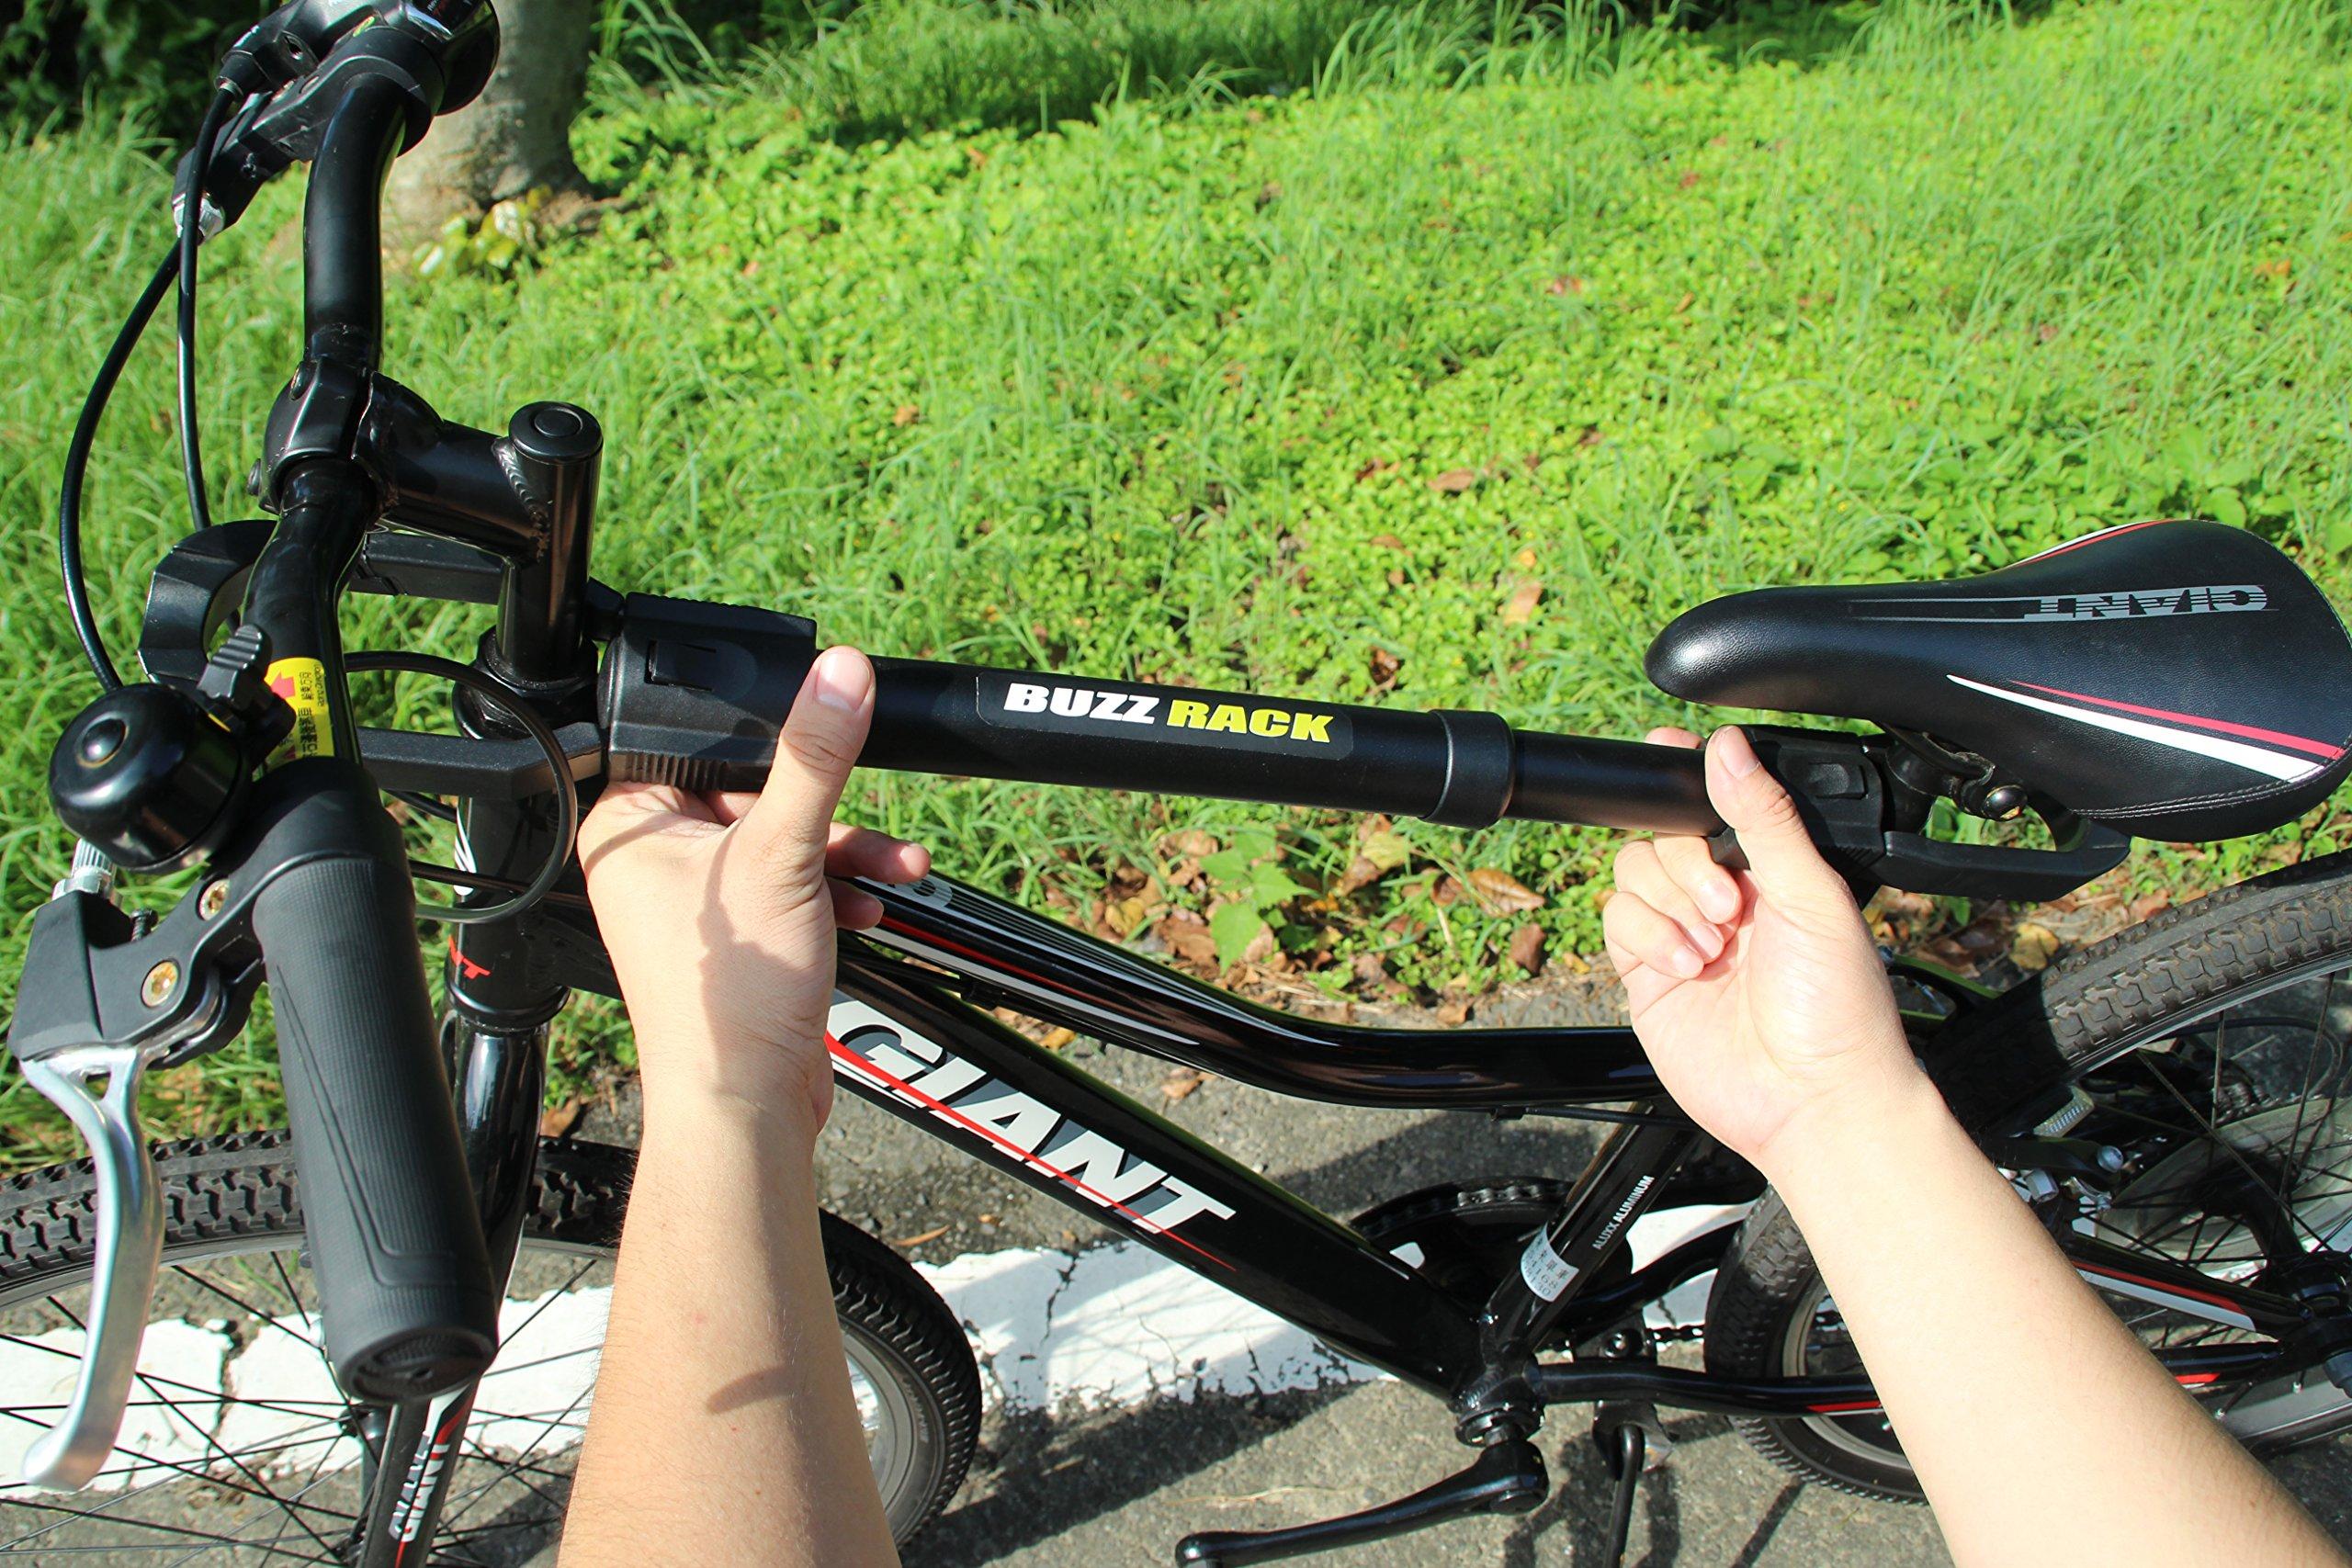 BUZZ RACK GRIP Deluxe Black Bike Top Frame Cross Bar Telescopic Adaptor by BUZZ RACK (Image #8)